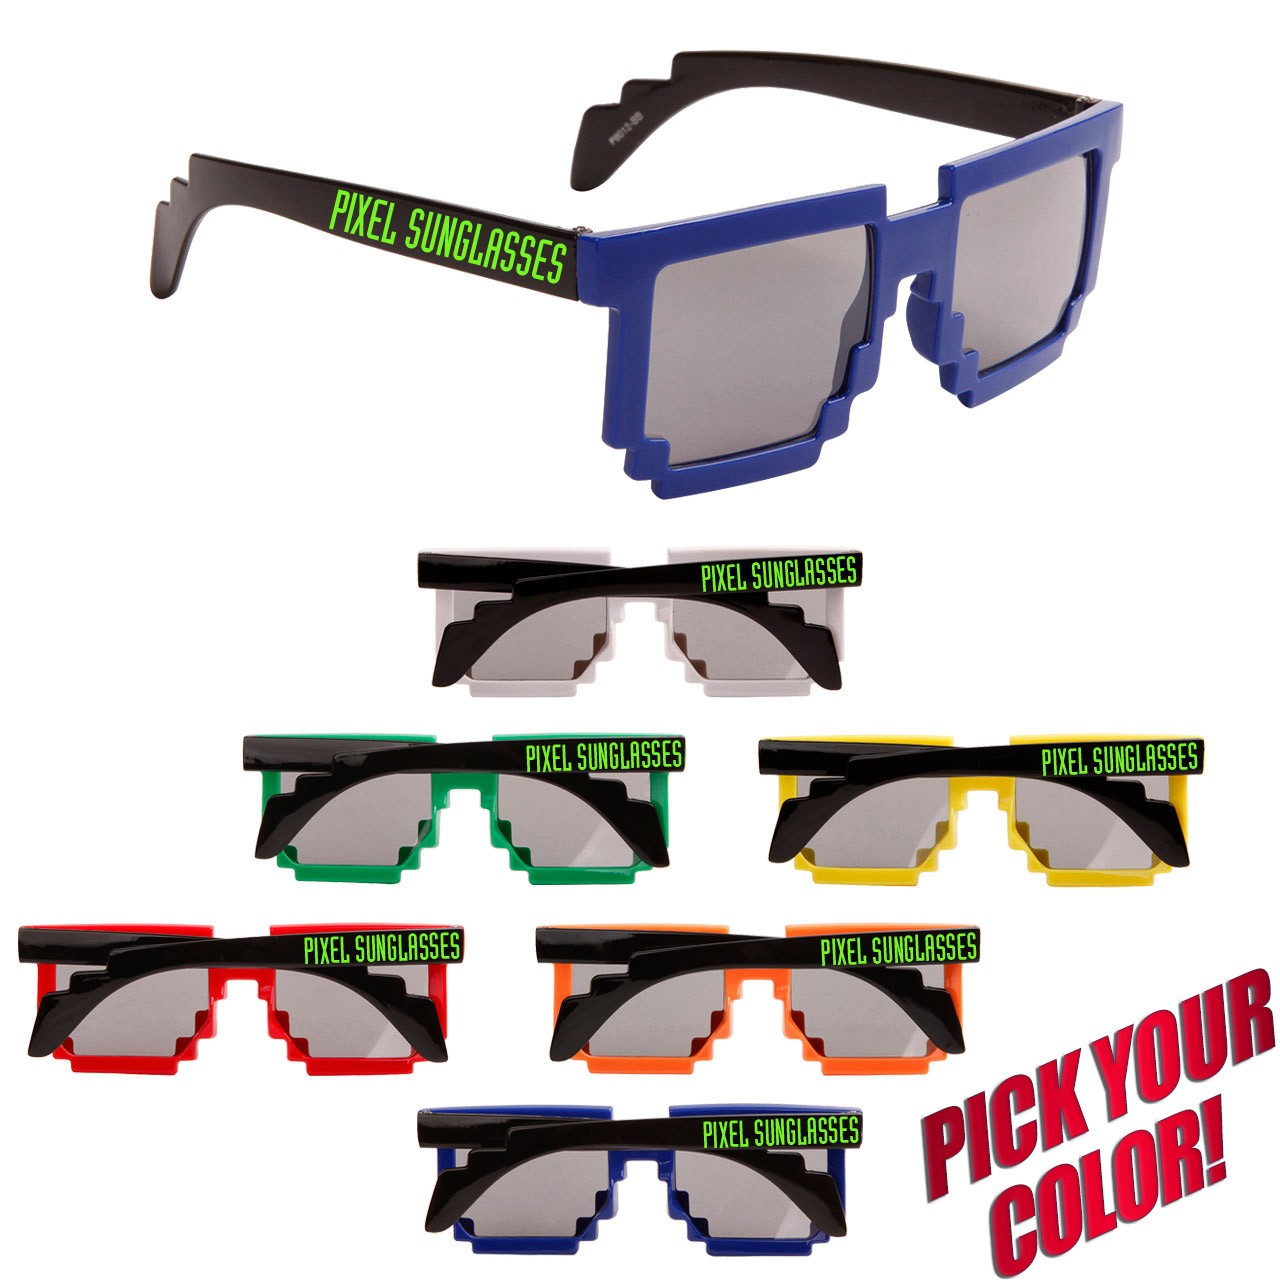 Customized Pixel Sunglasses Cheap